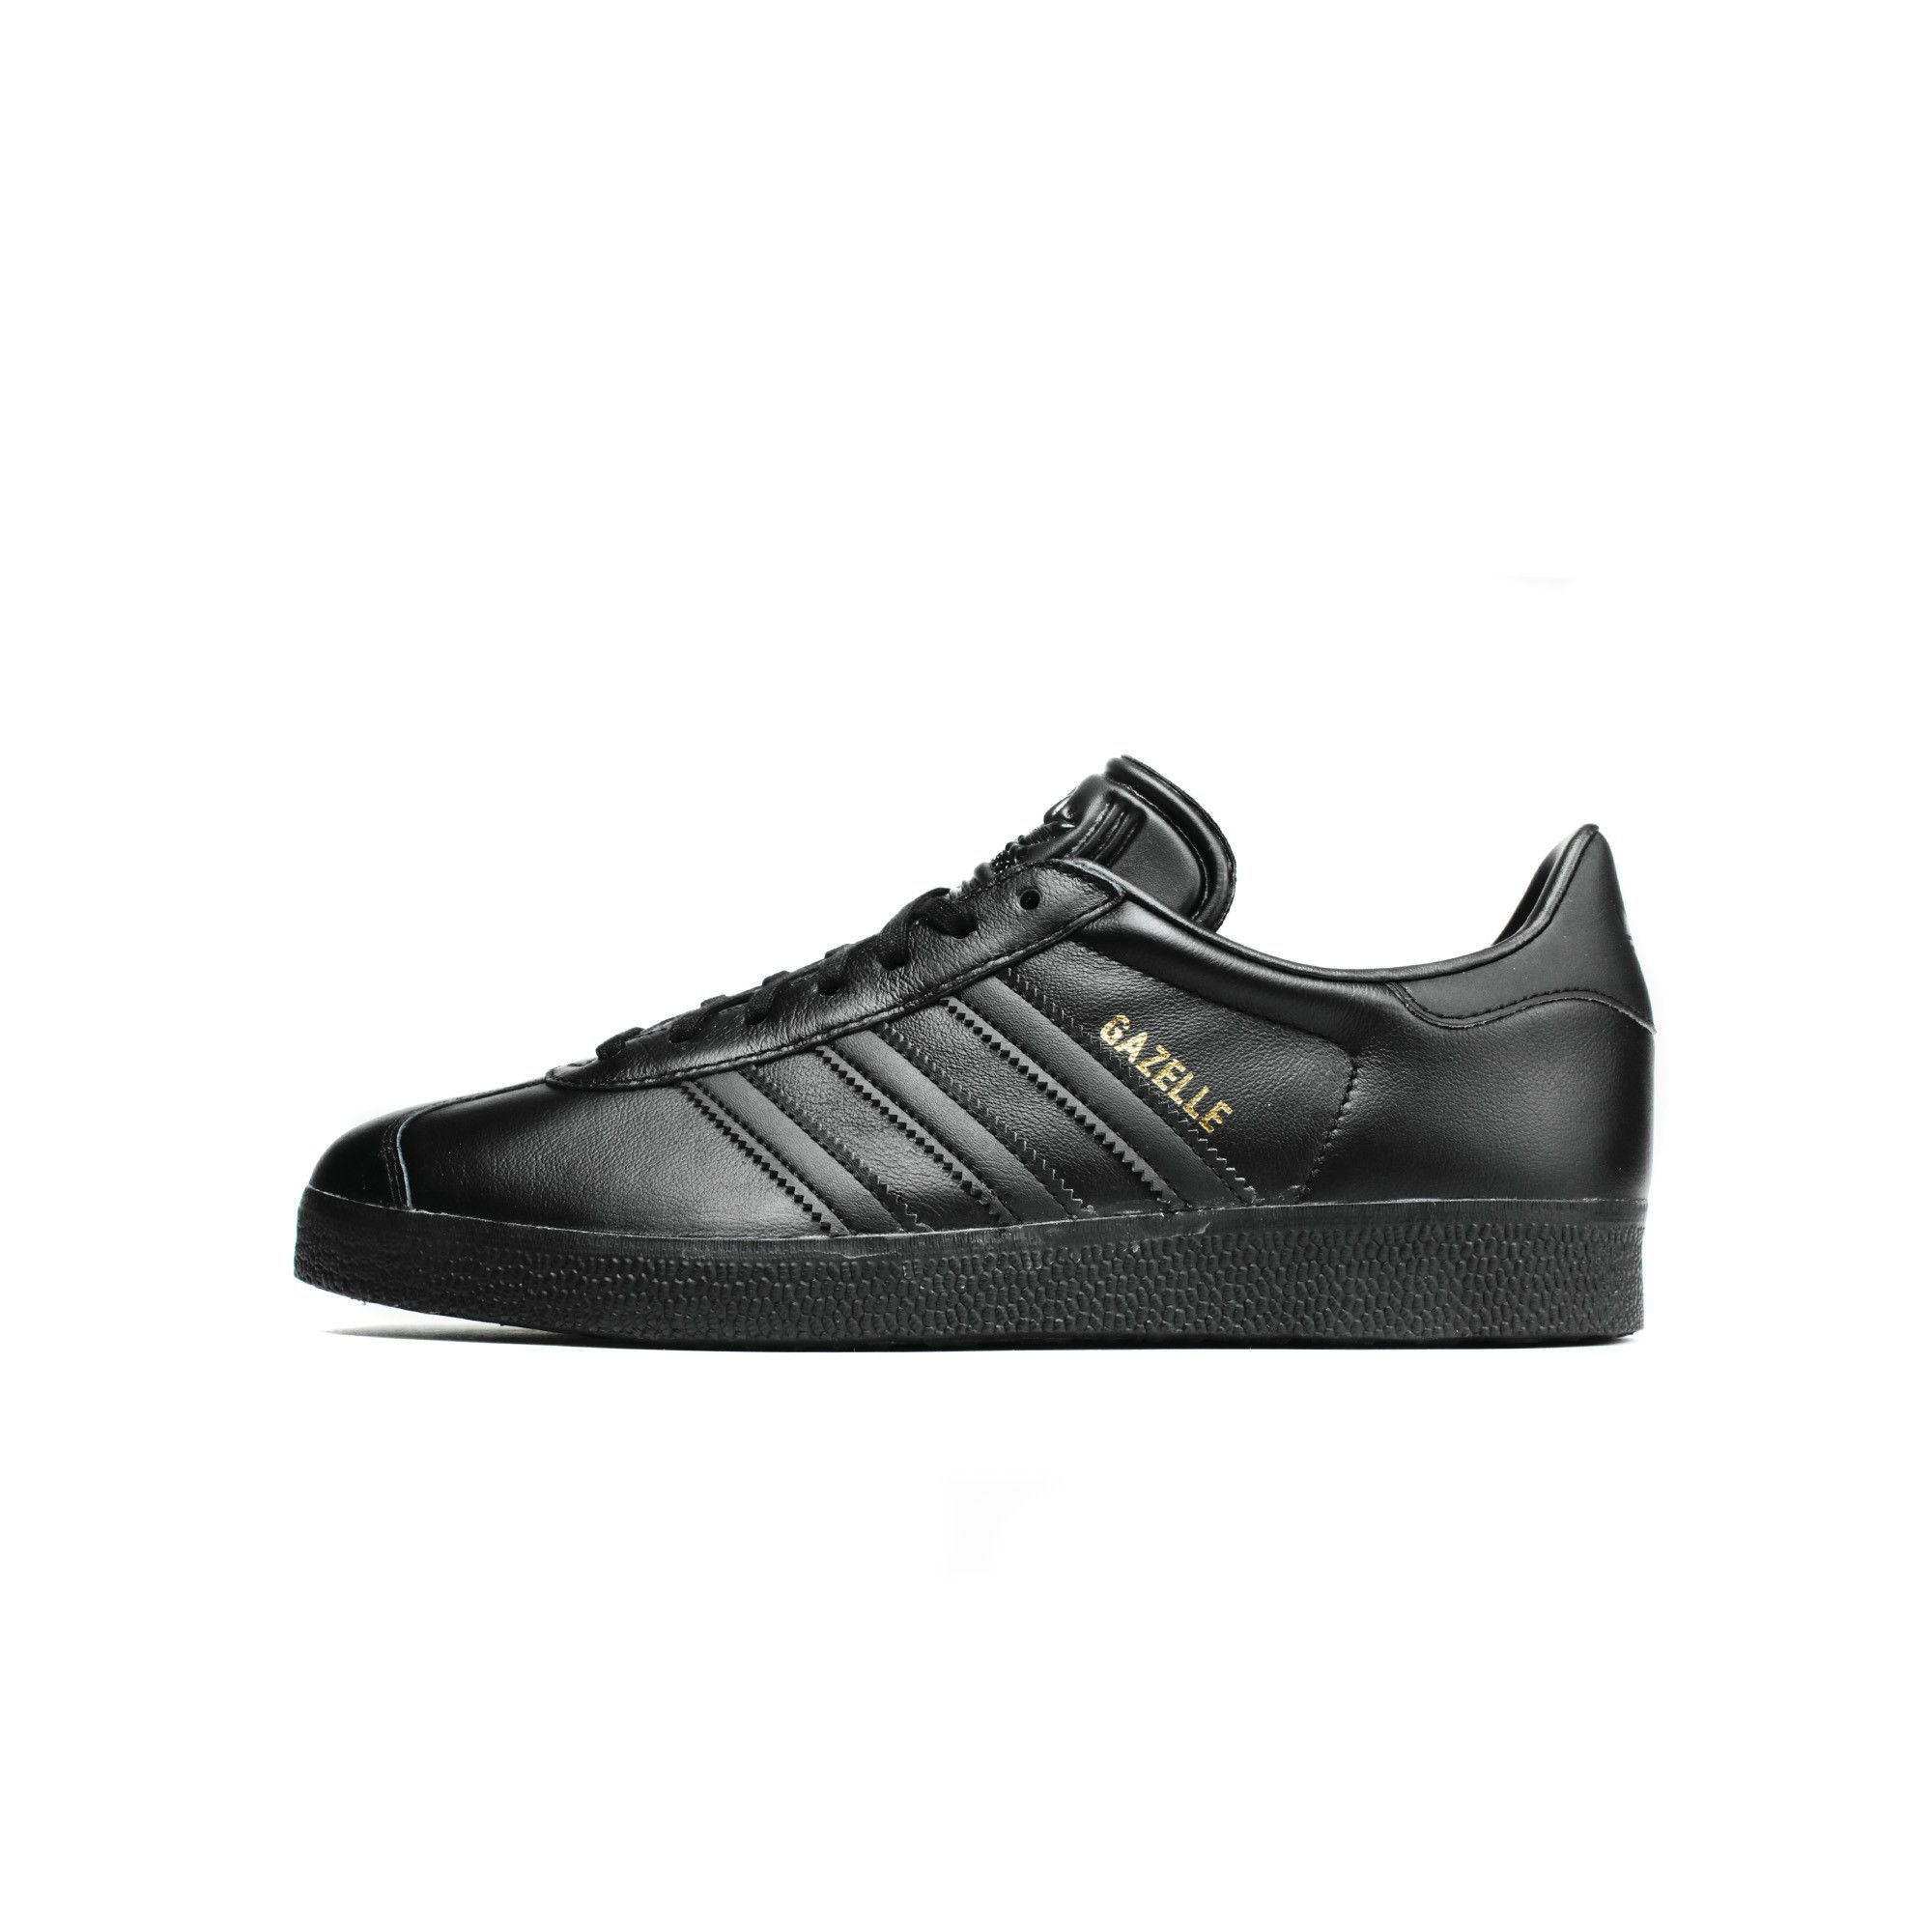 separation shoes 2e830 e651f Adidas Mens Gazelle BB5497